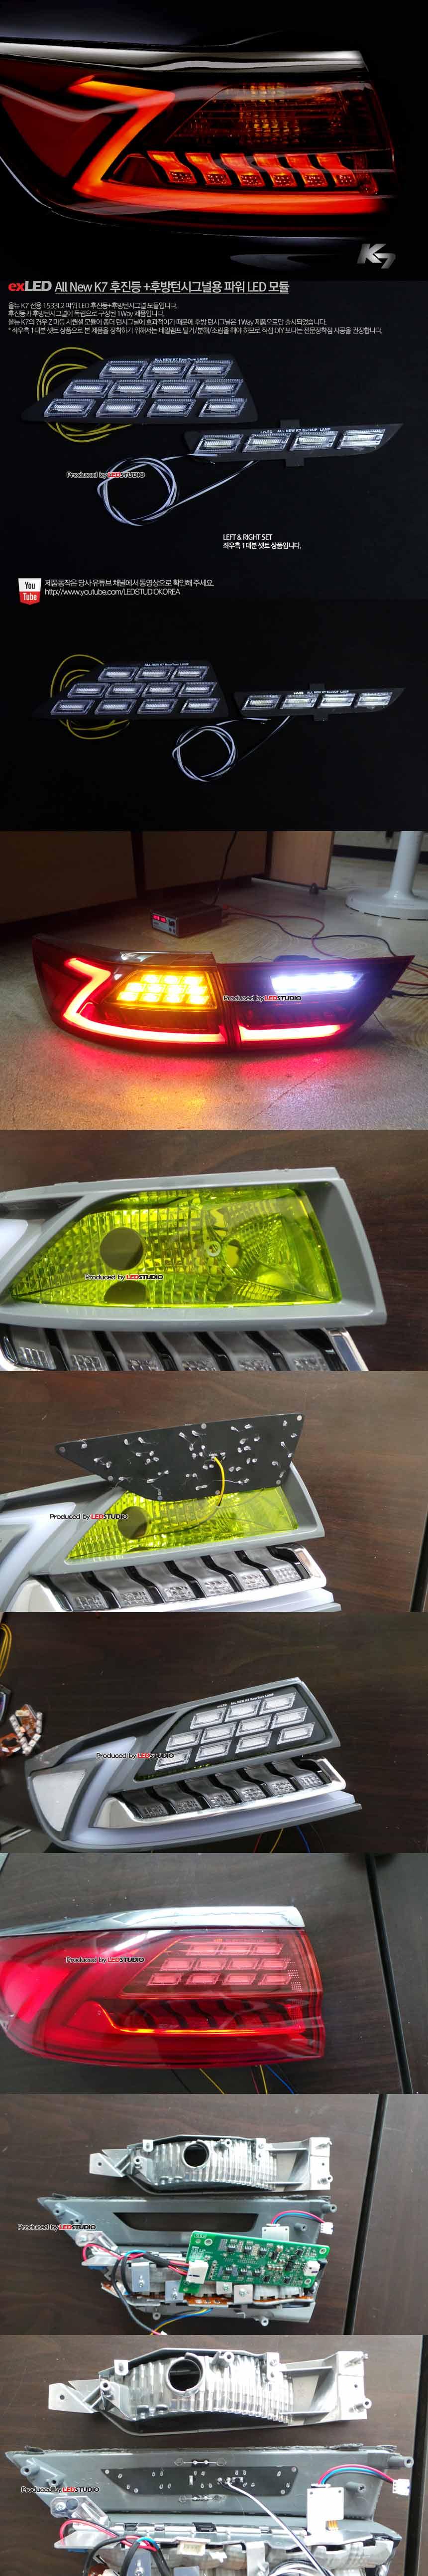 exLED 올뉴K7용 후진등+후방턴시그널 1Way 파워 LED 모듈